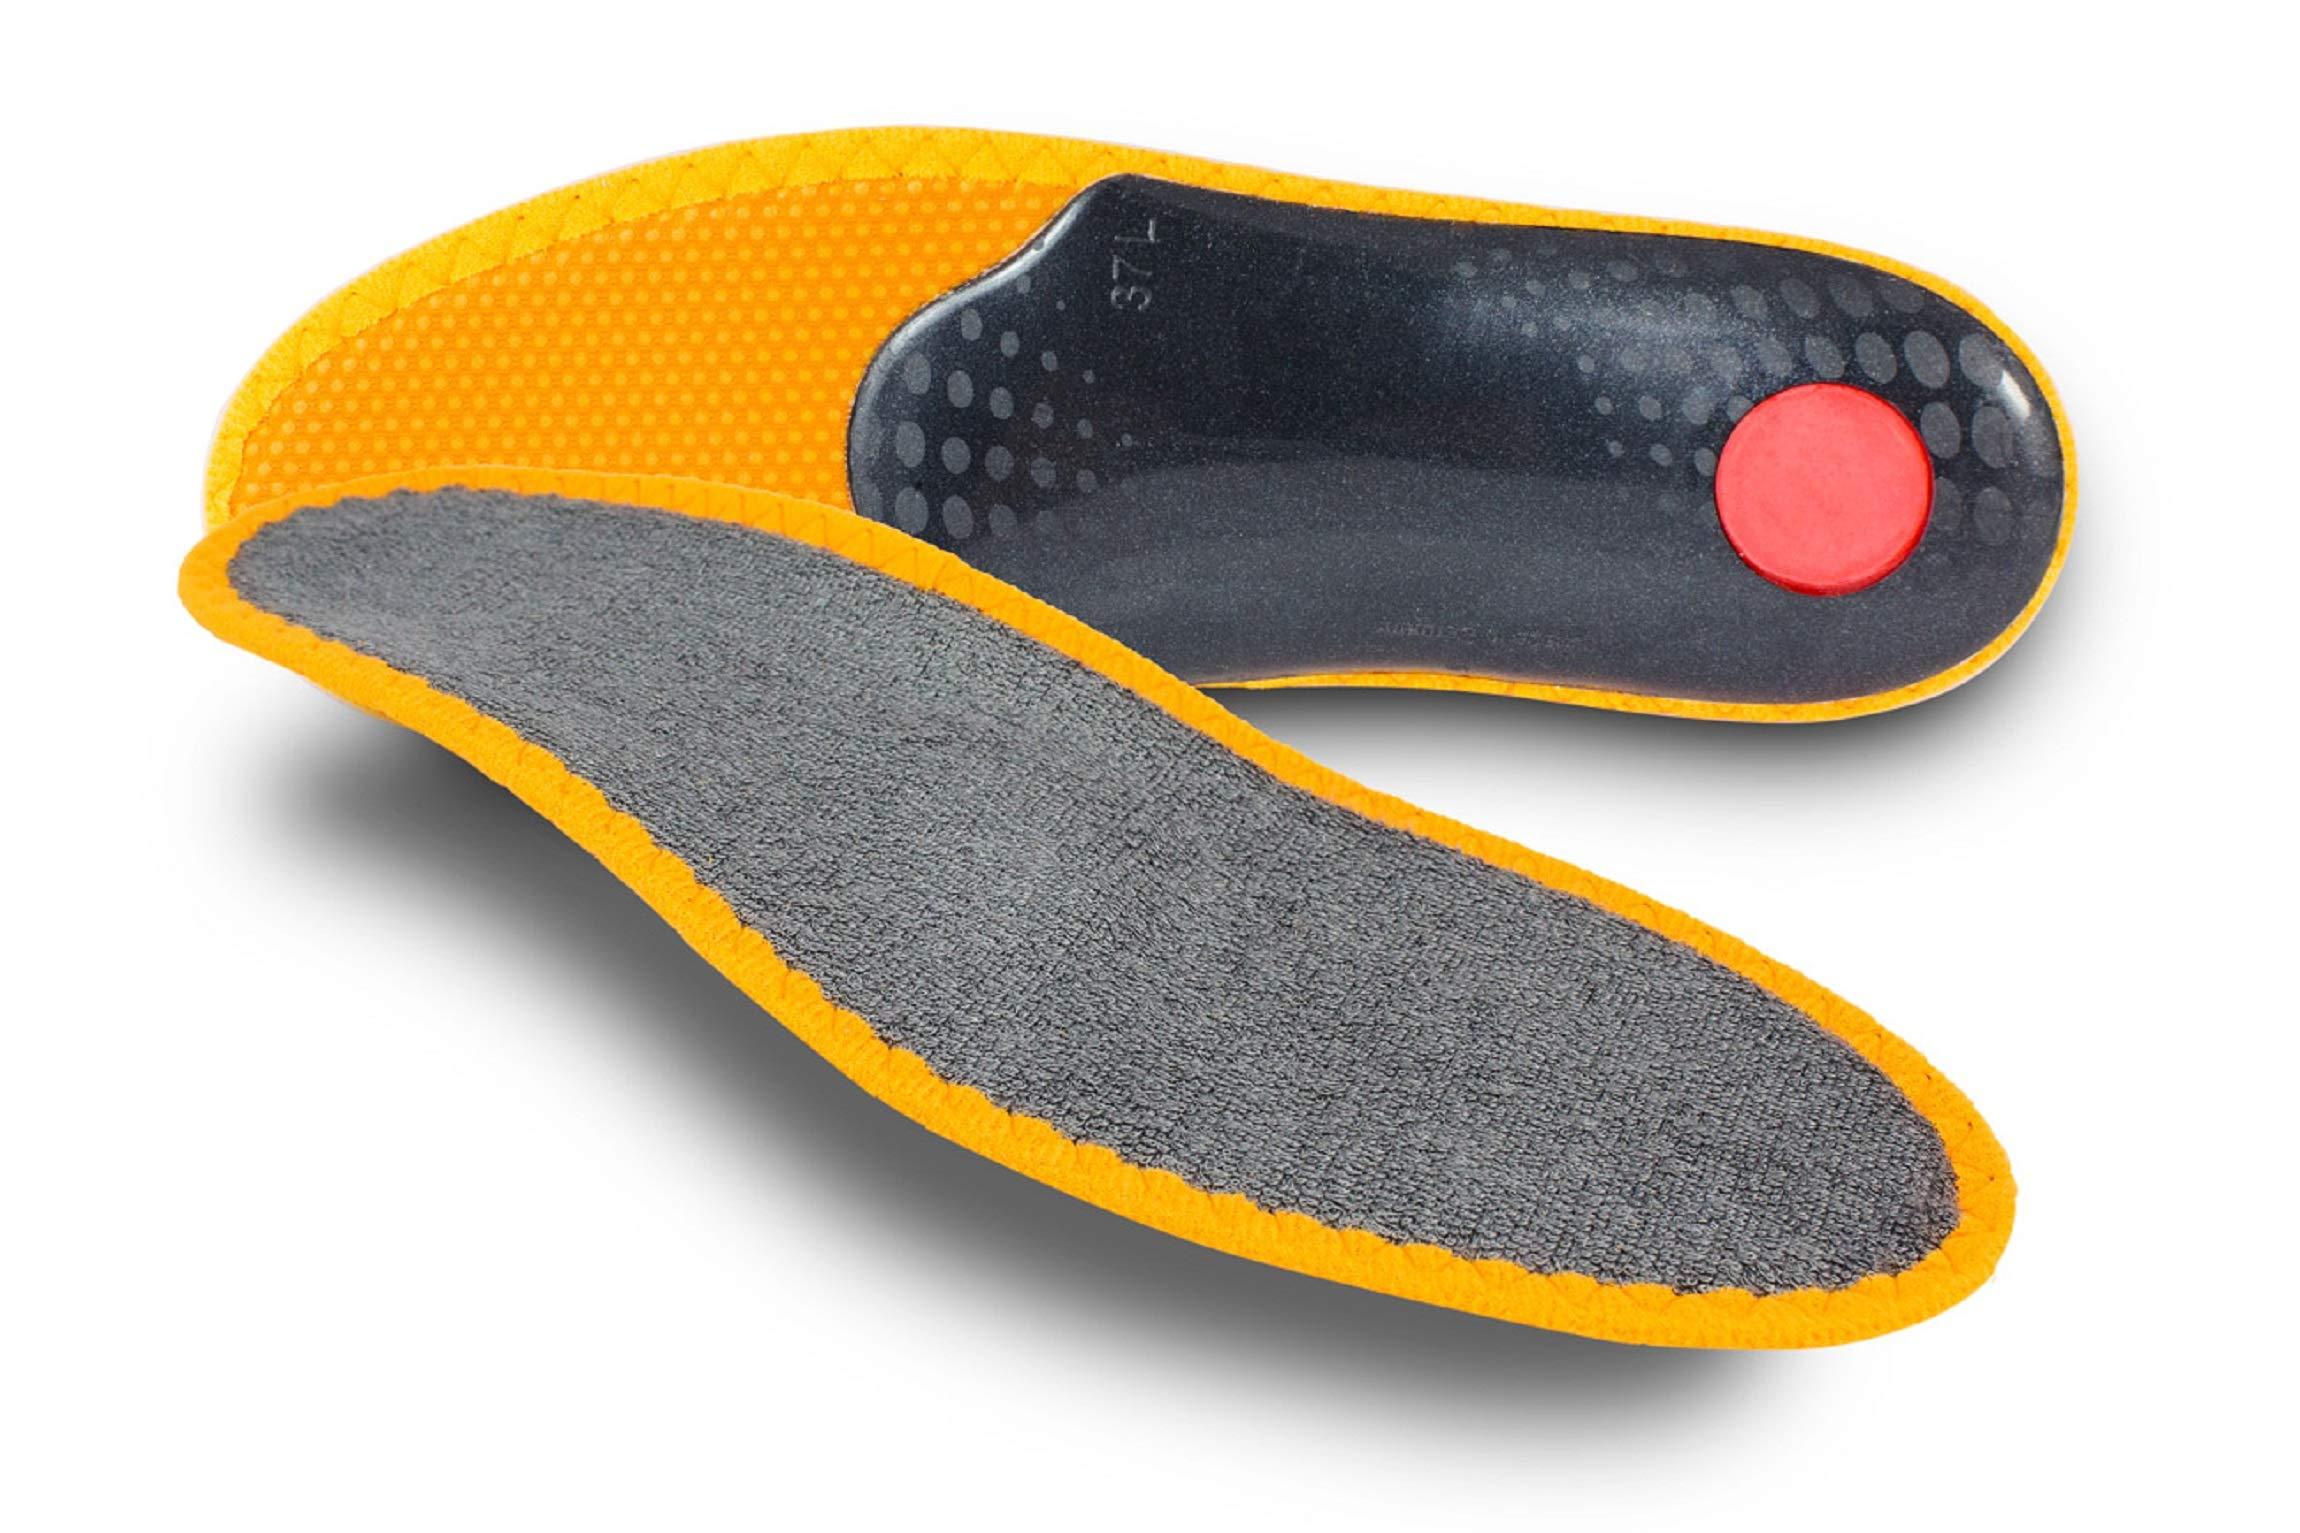 Pedag Sneaker Magic Step Memory Foam Orthotic Insole, M12/eu 45, 4.0 Ounce